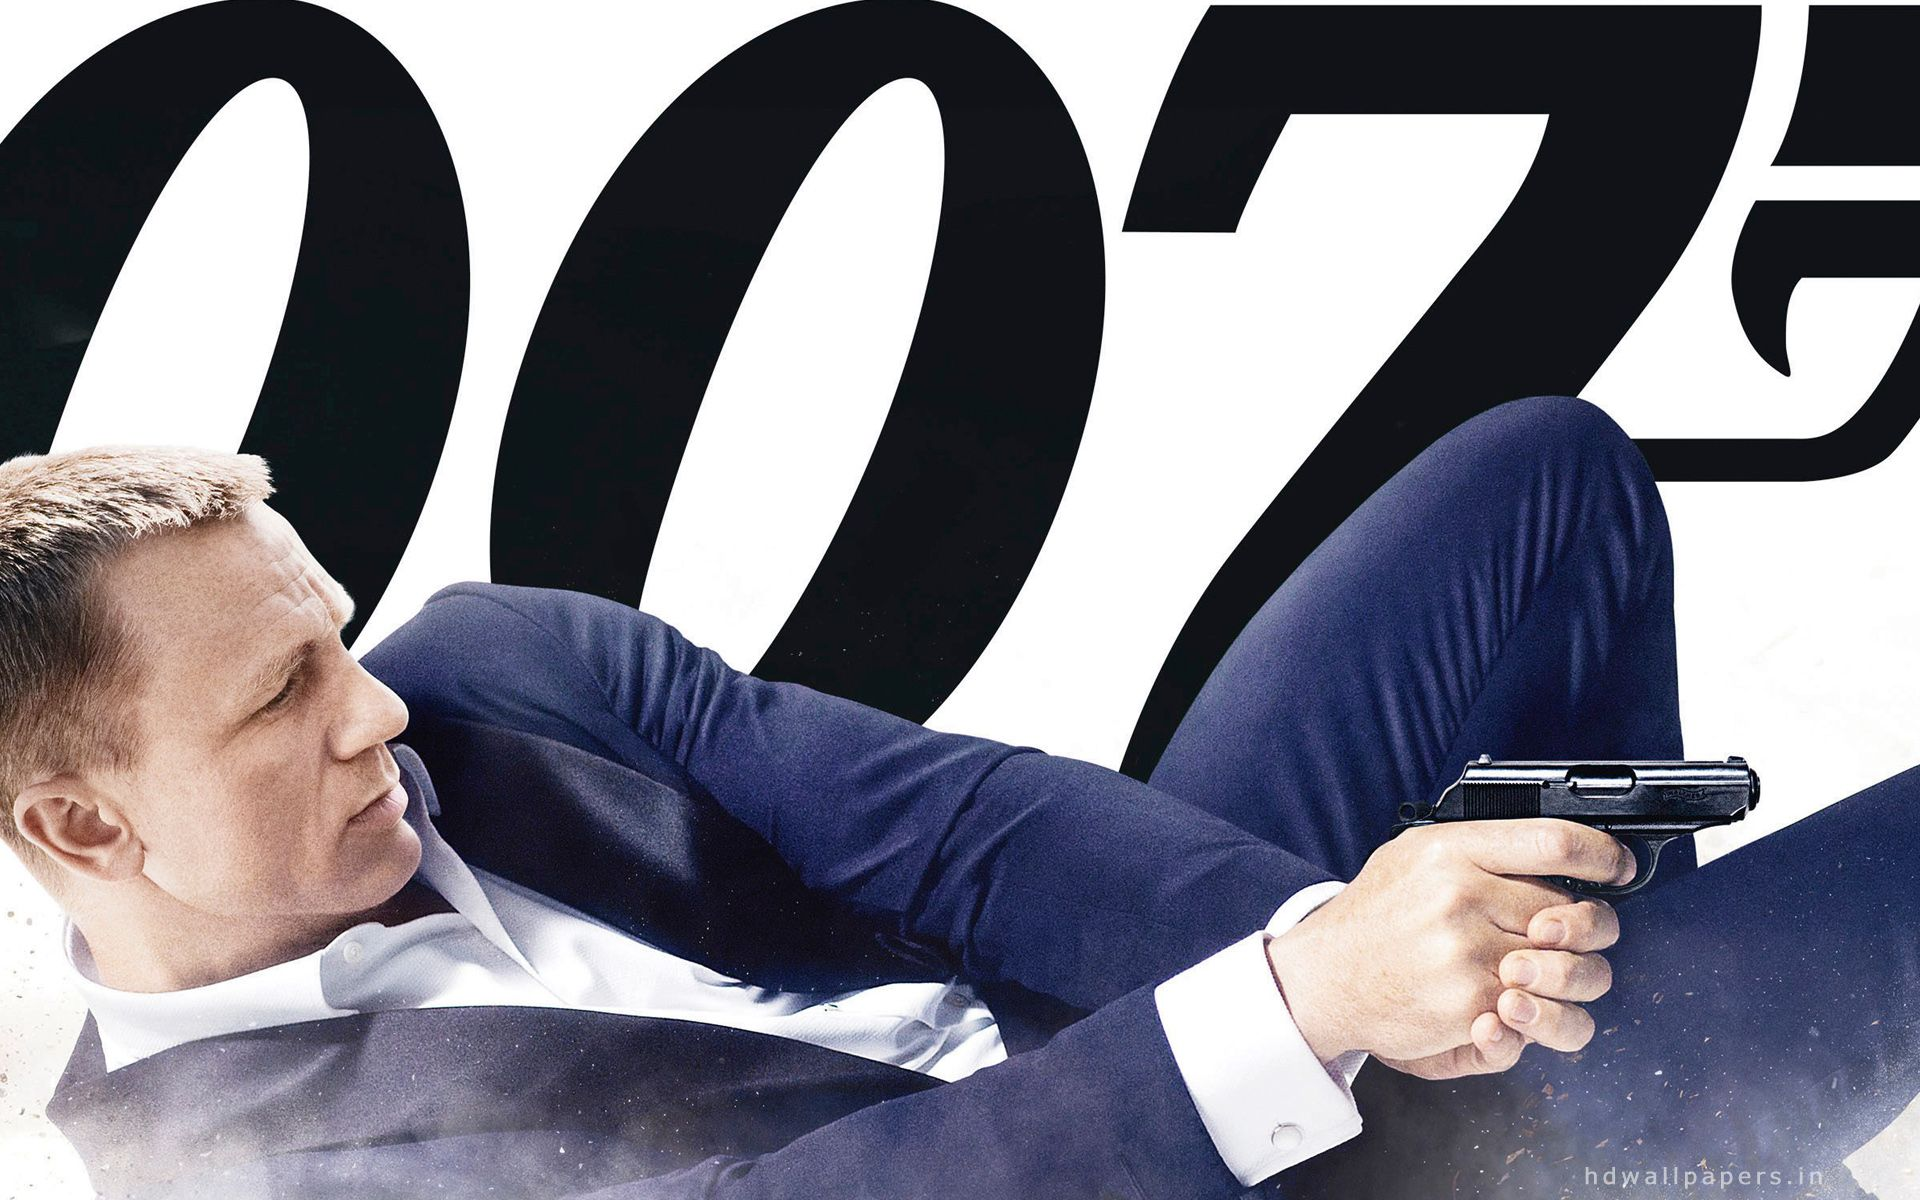 daniel craig 007 hd wallpapers | wallpapers | pinterest | daniel